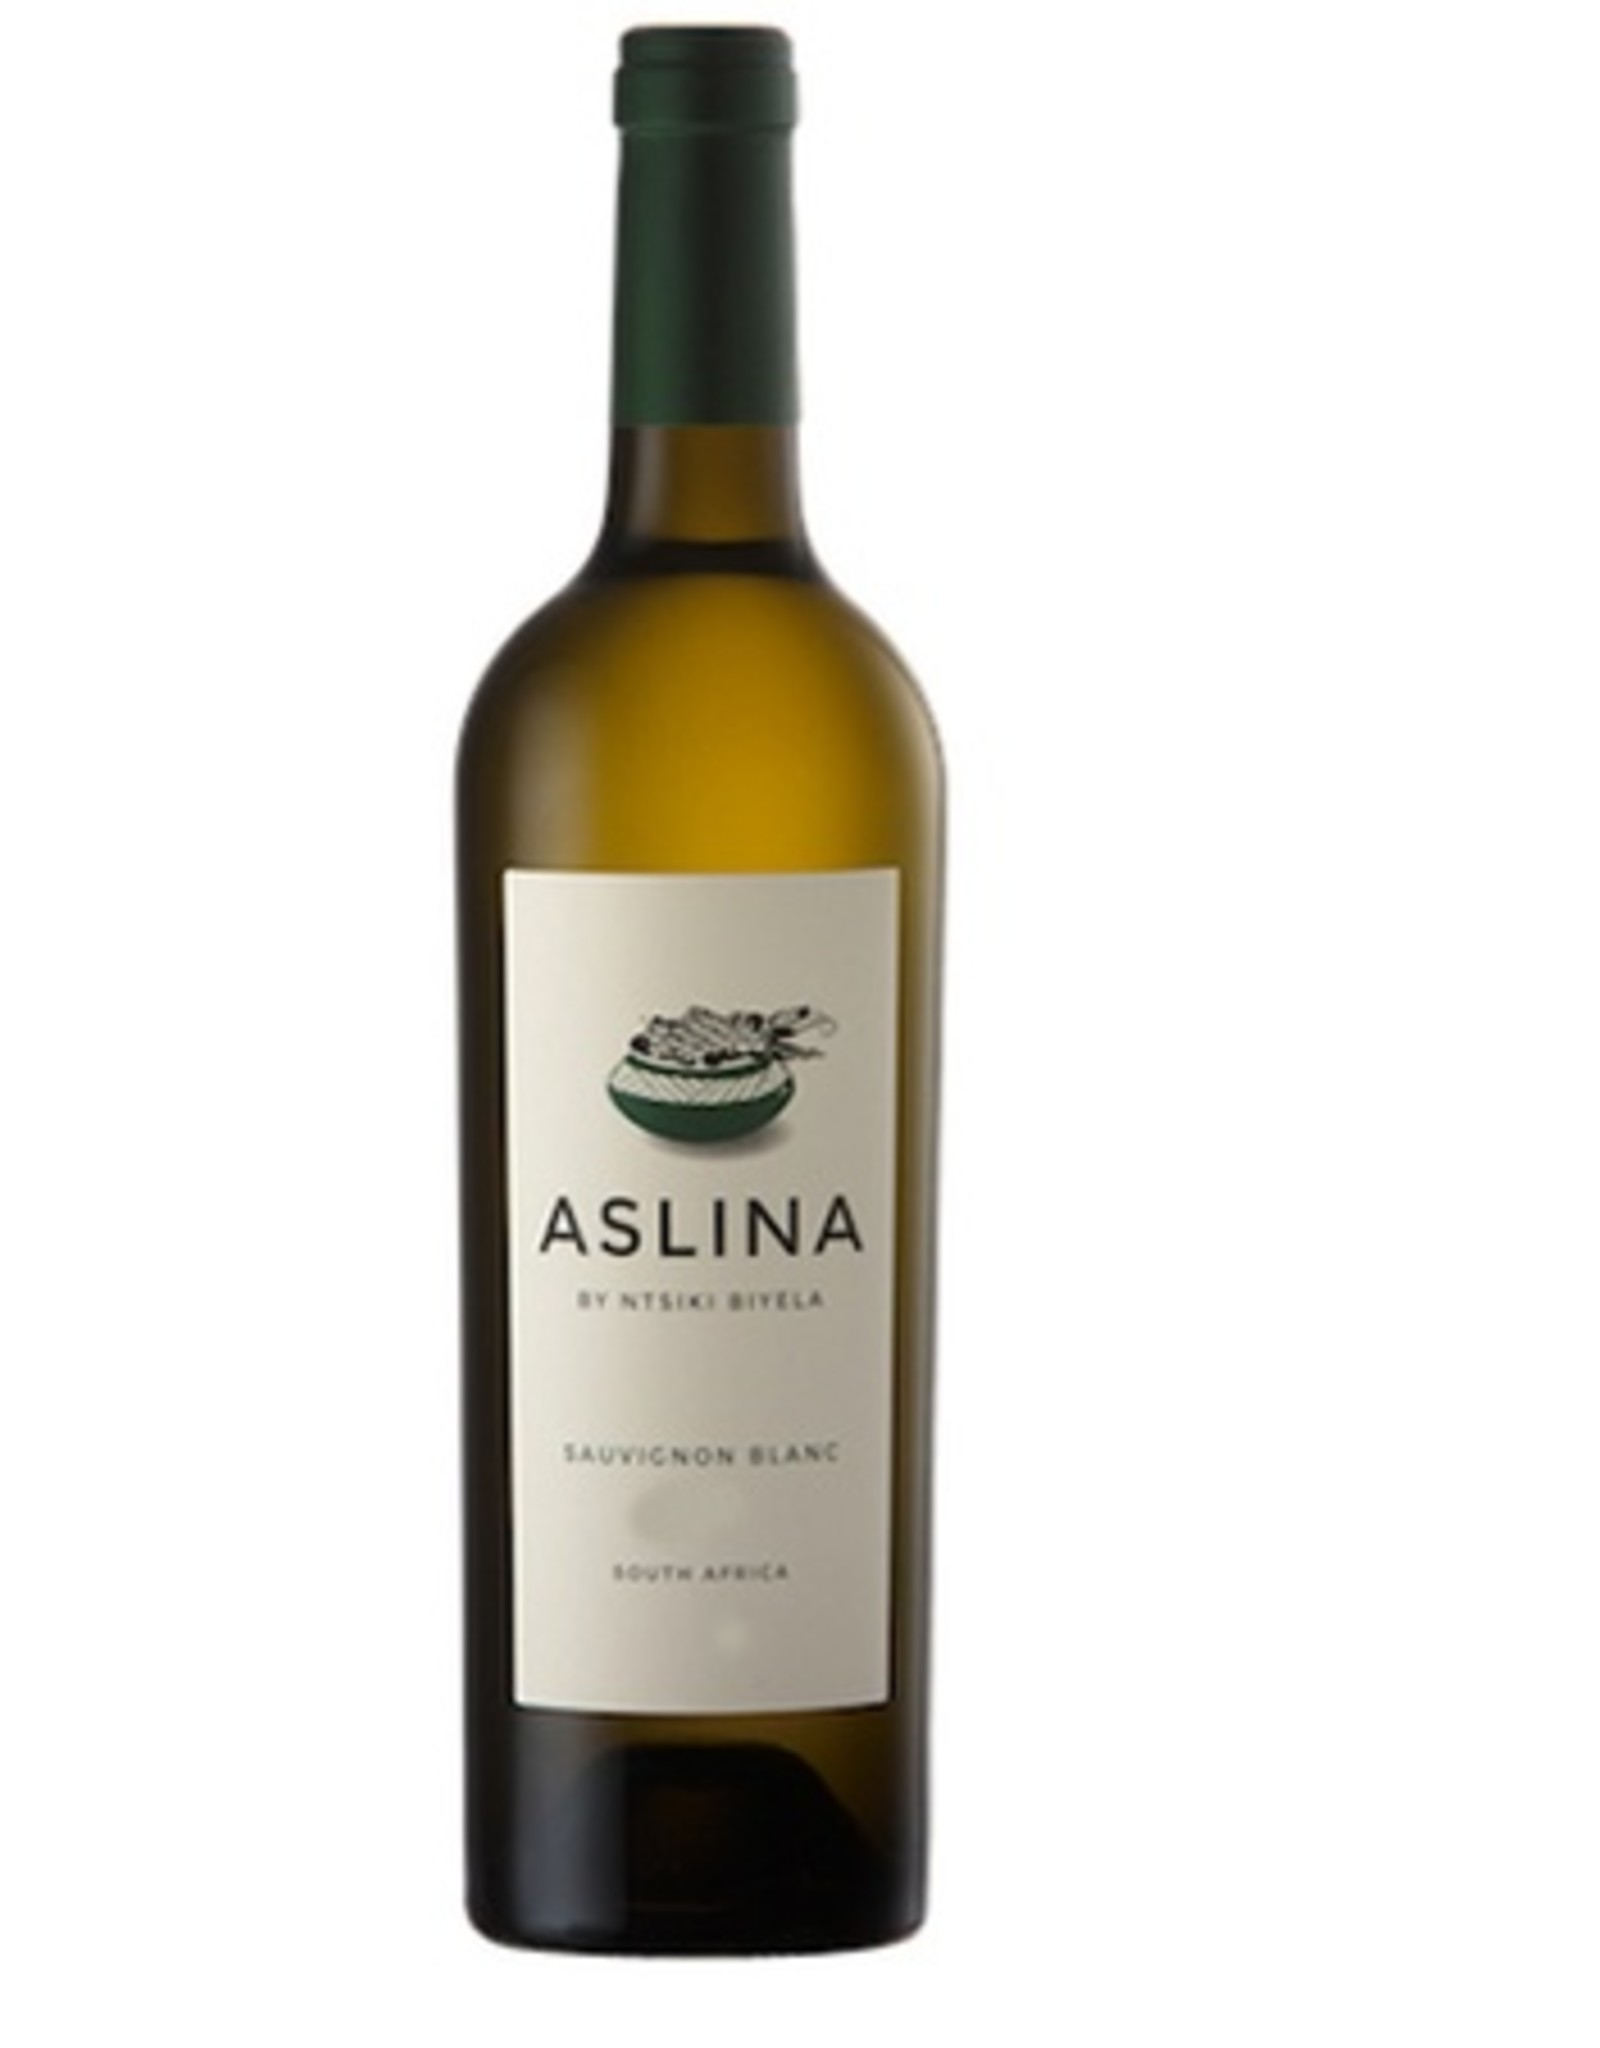 Aslina by Ntsiki Biyela Chardonnay South Africa 2018